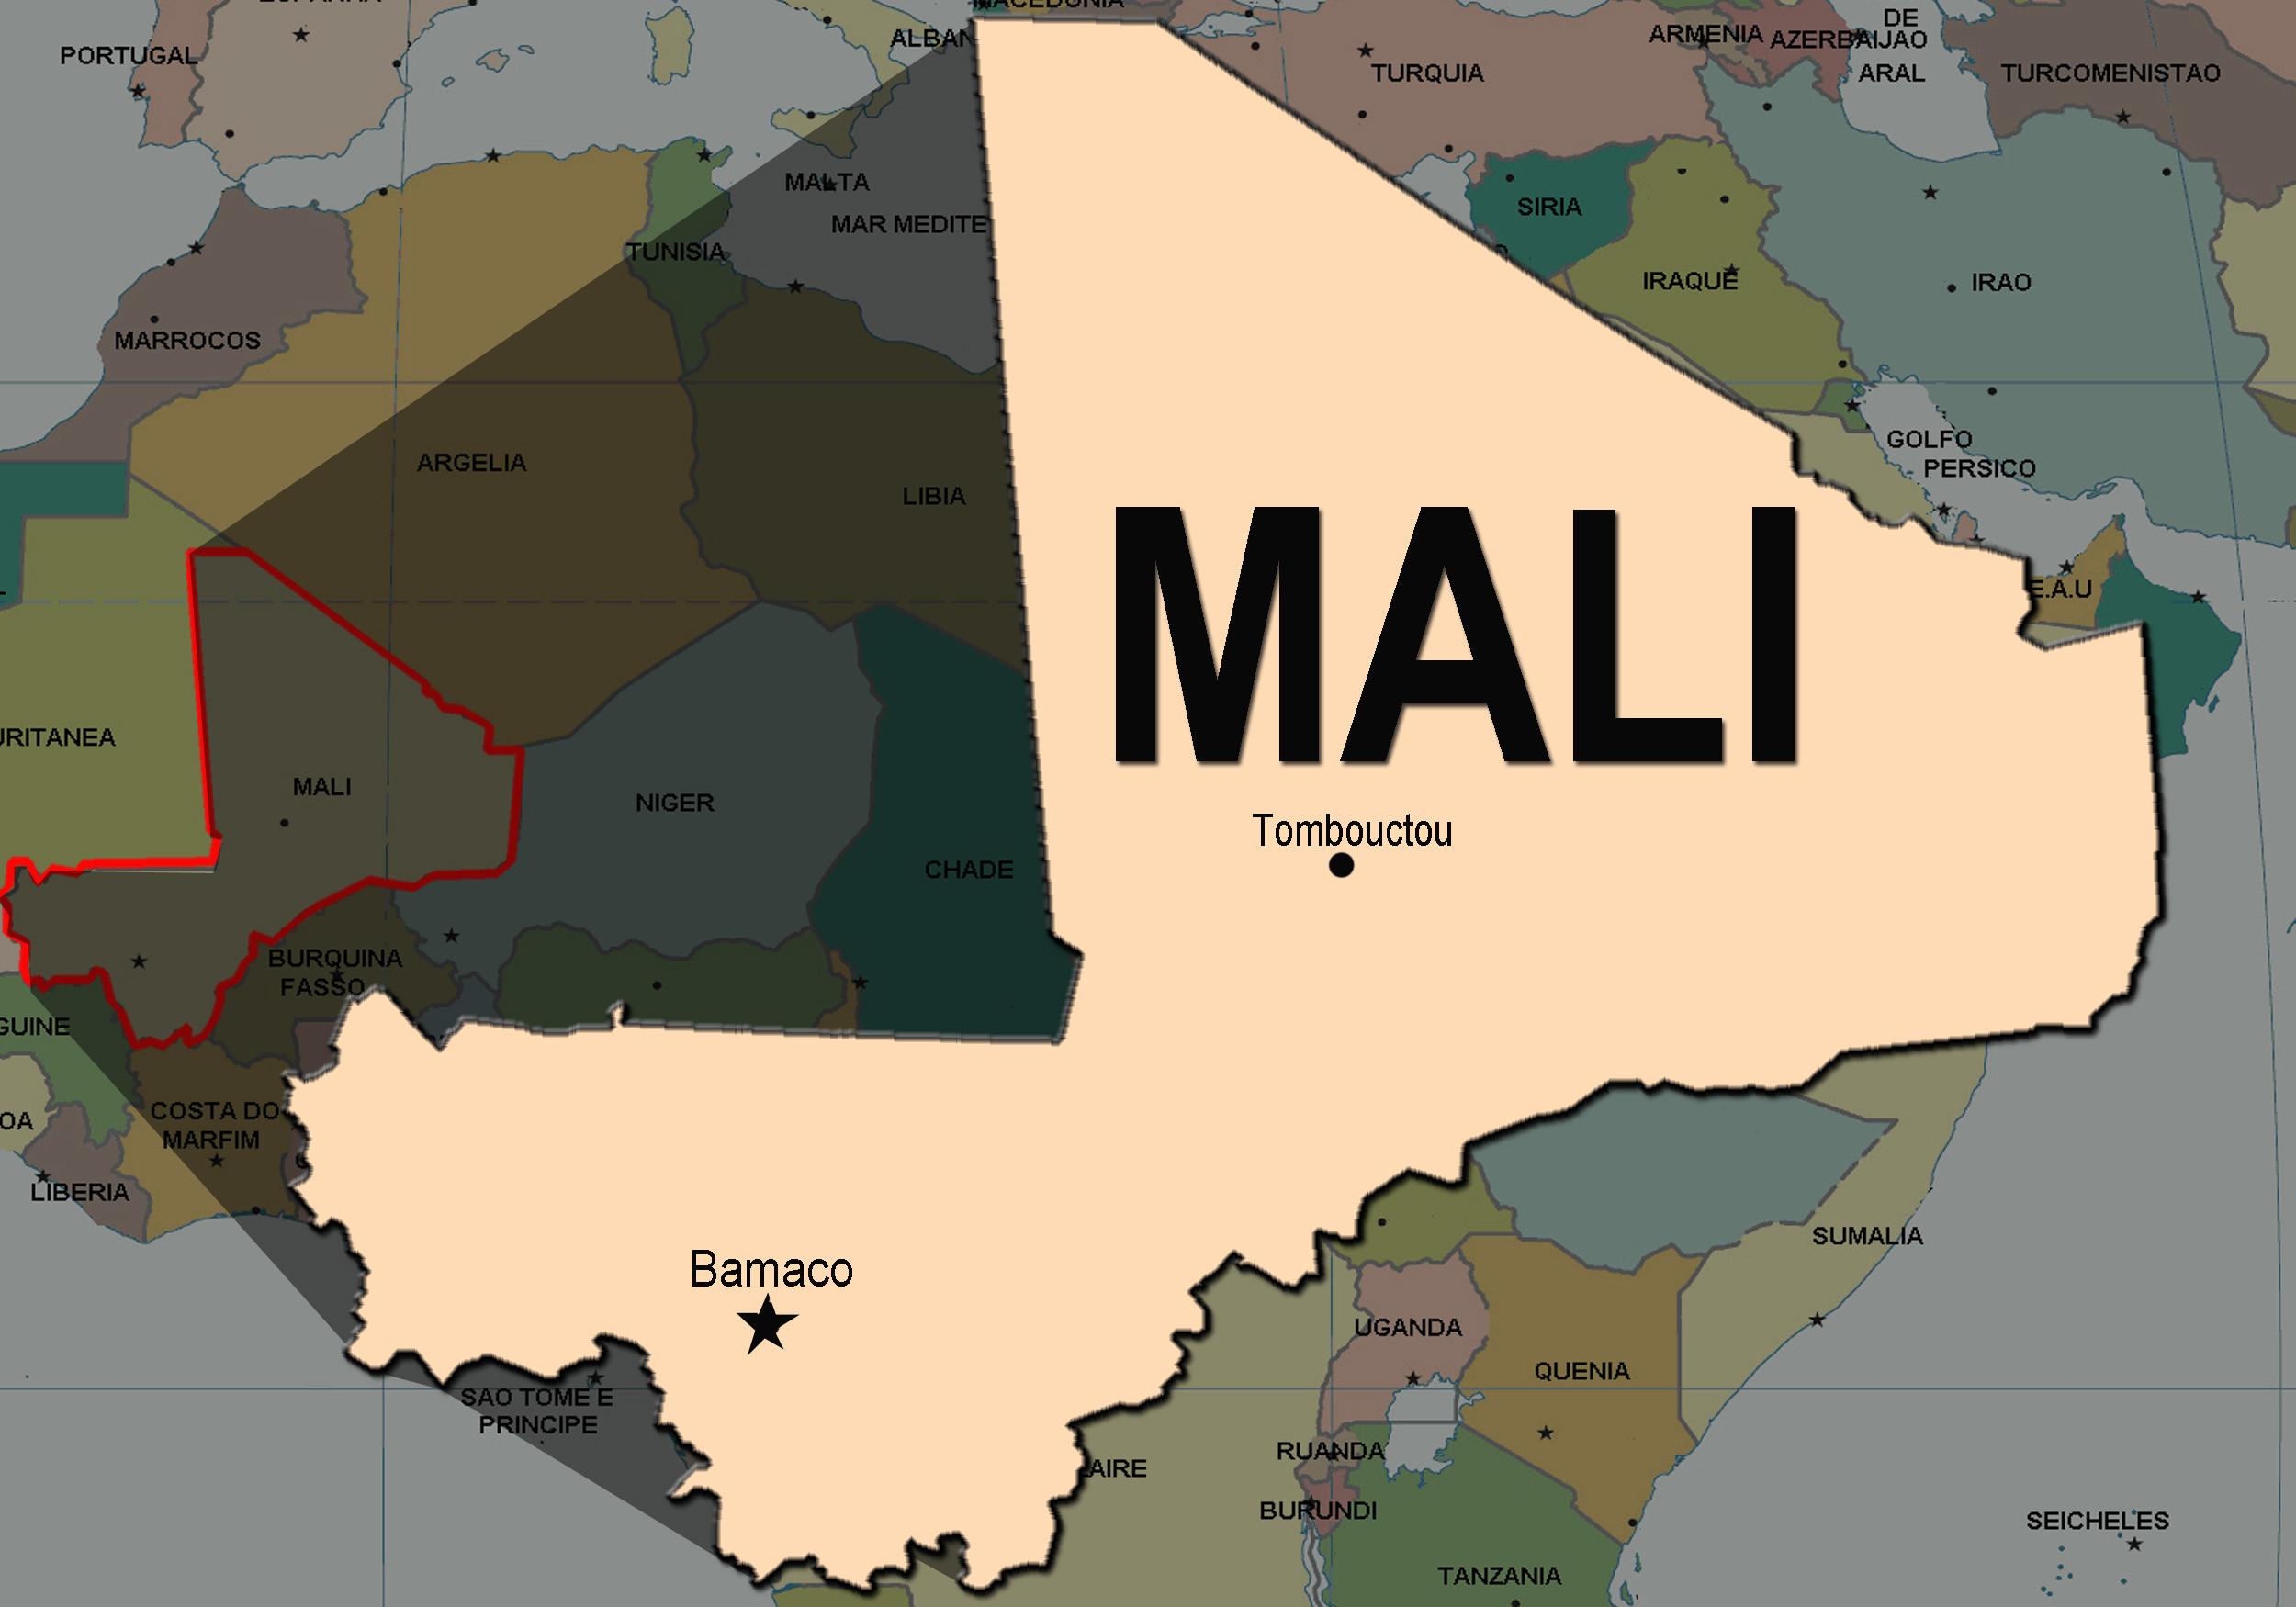 Número de militares mortos no Mali sobe para 13